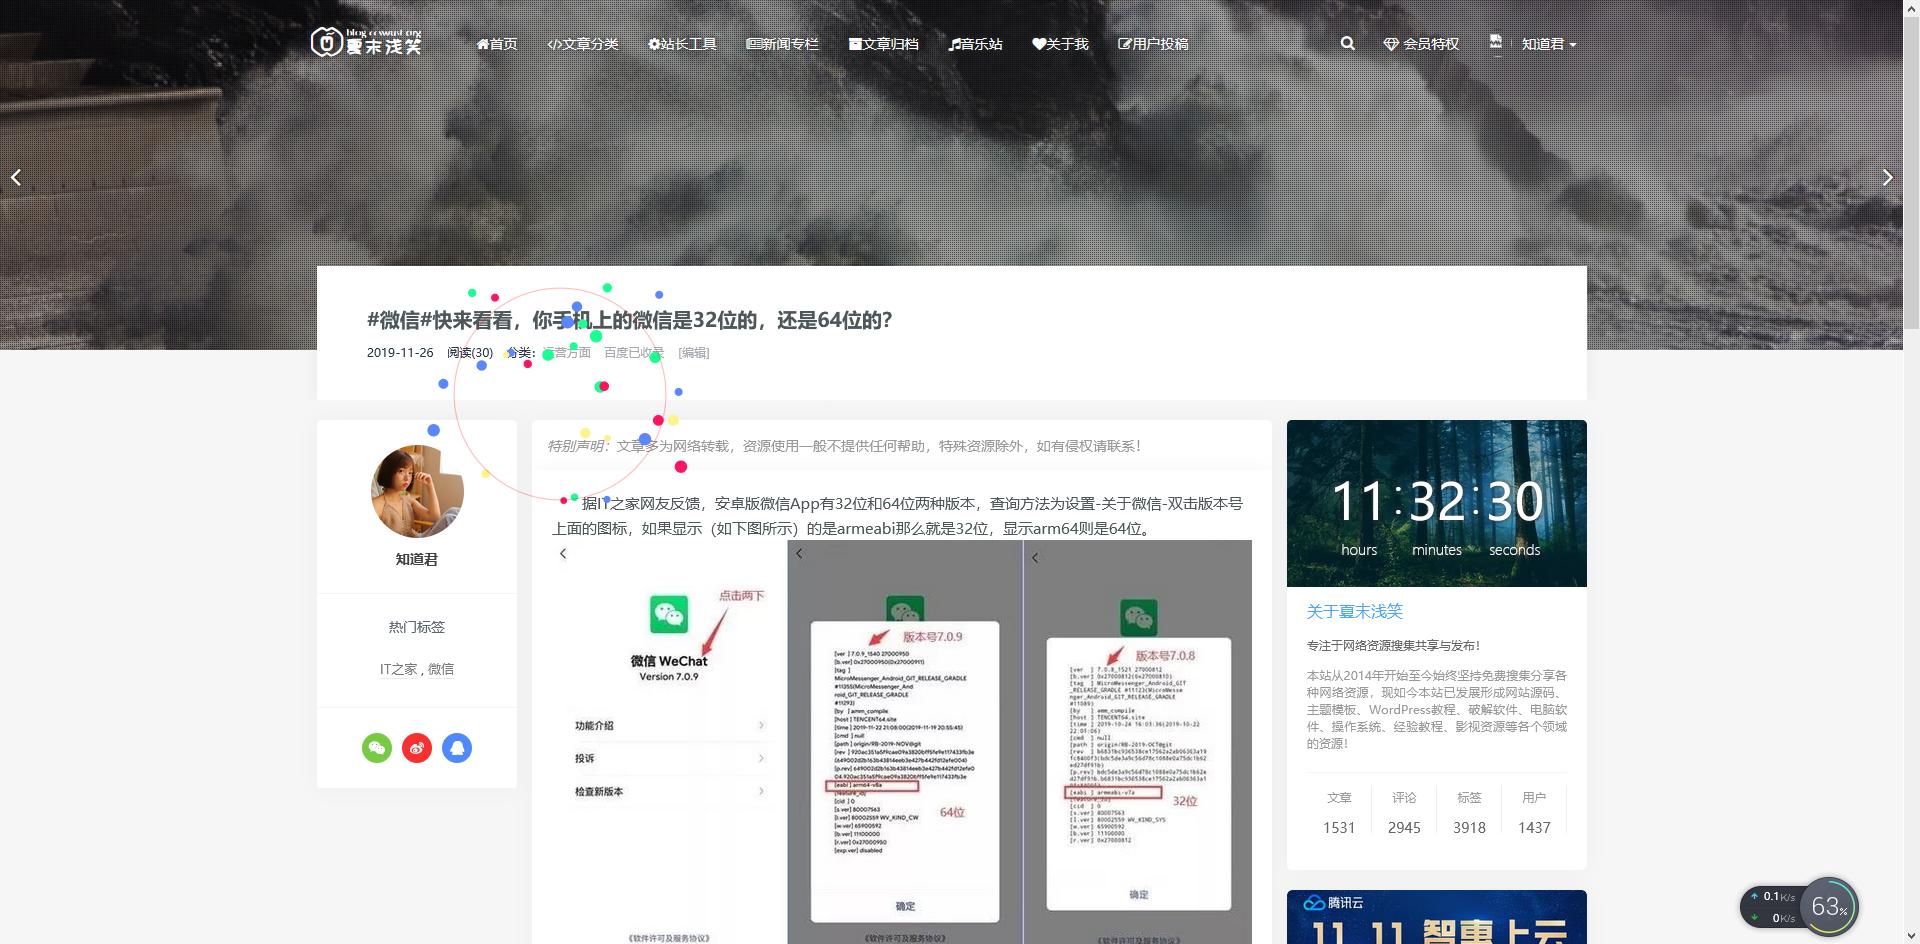 #wordpress#vieu主题添加点击特效,让你的网站duang的一下~-福利博客